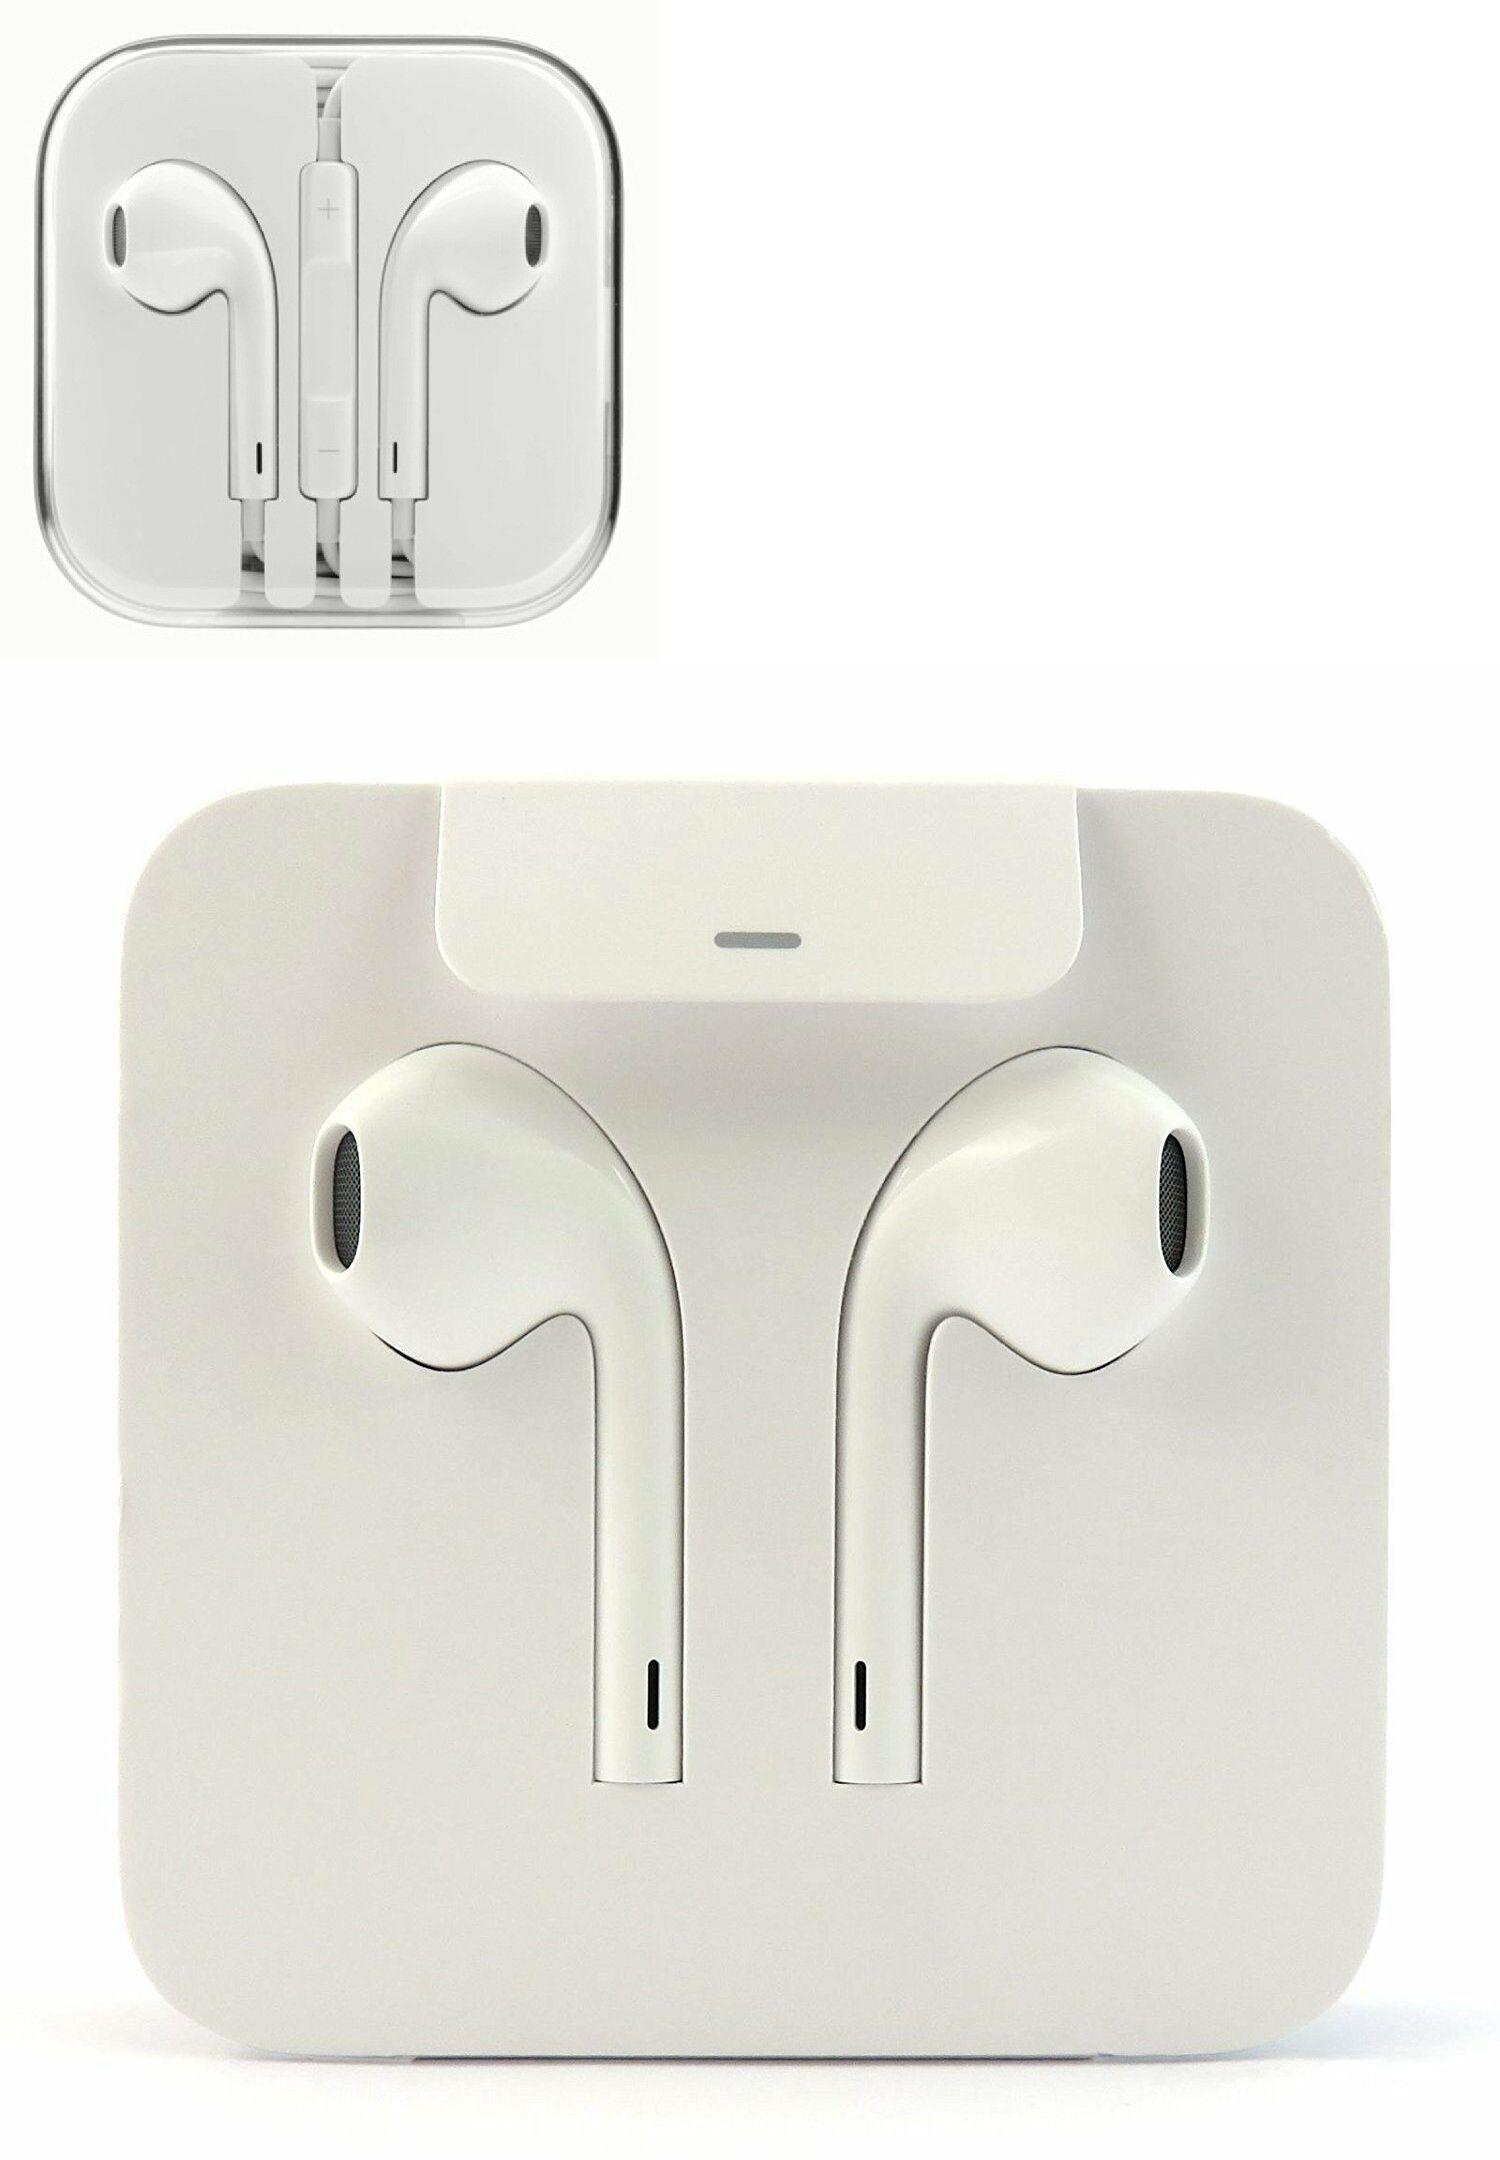 Apple Earpods Earphones Iphone 11 12 Xs Max Xr 8 7 6 Remote Mic New Original Apple Headphone Iphone Apple